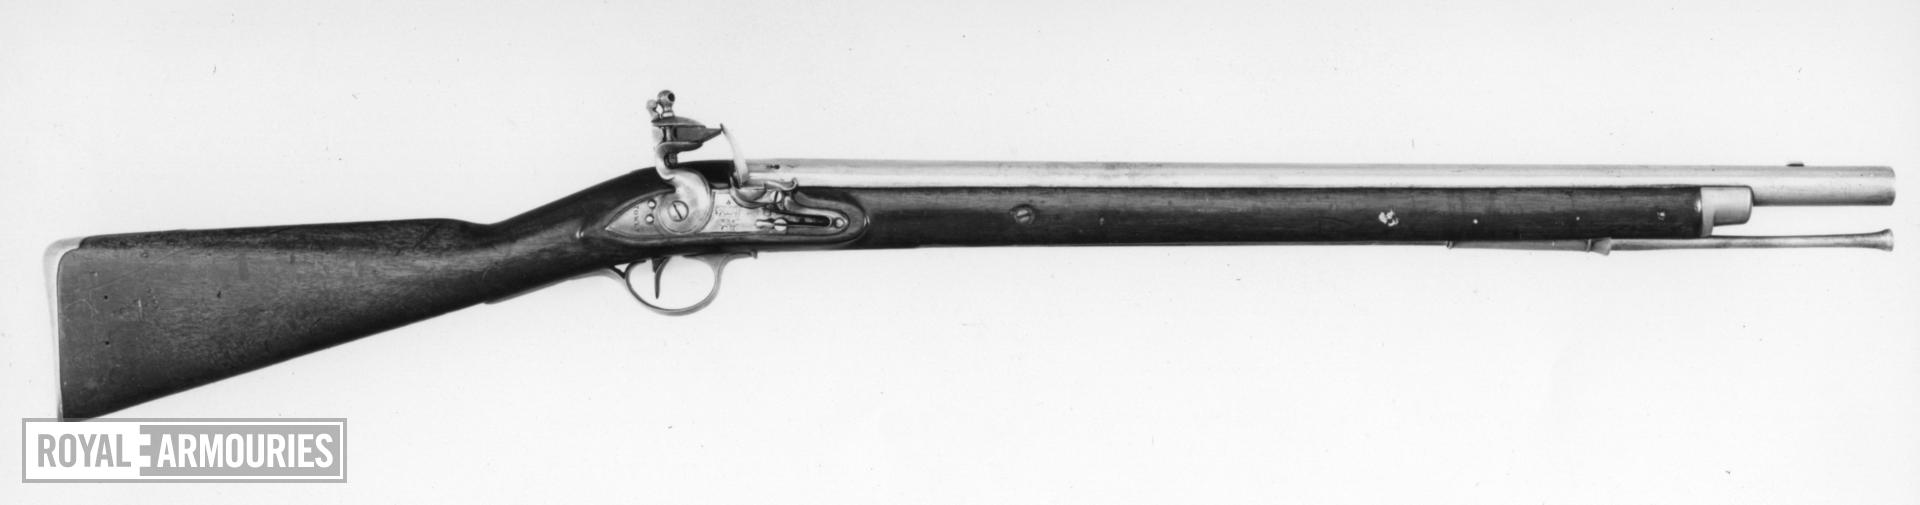 Flintlock muzzle-loading military carbine - Pattern 1796 Heavy Dragoon